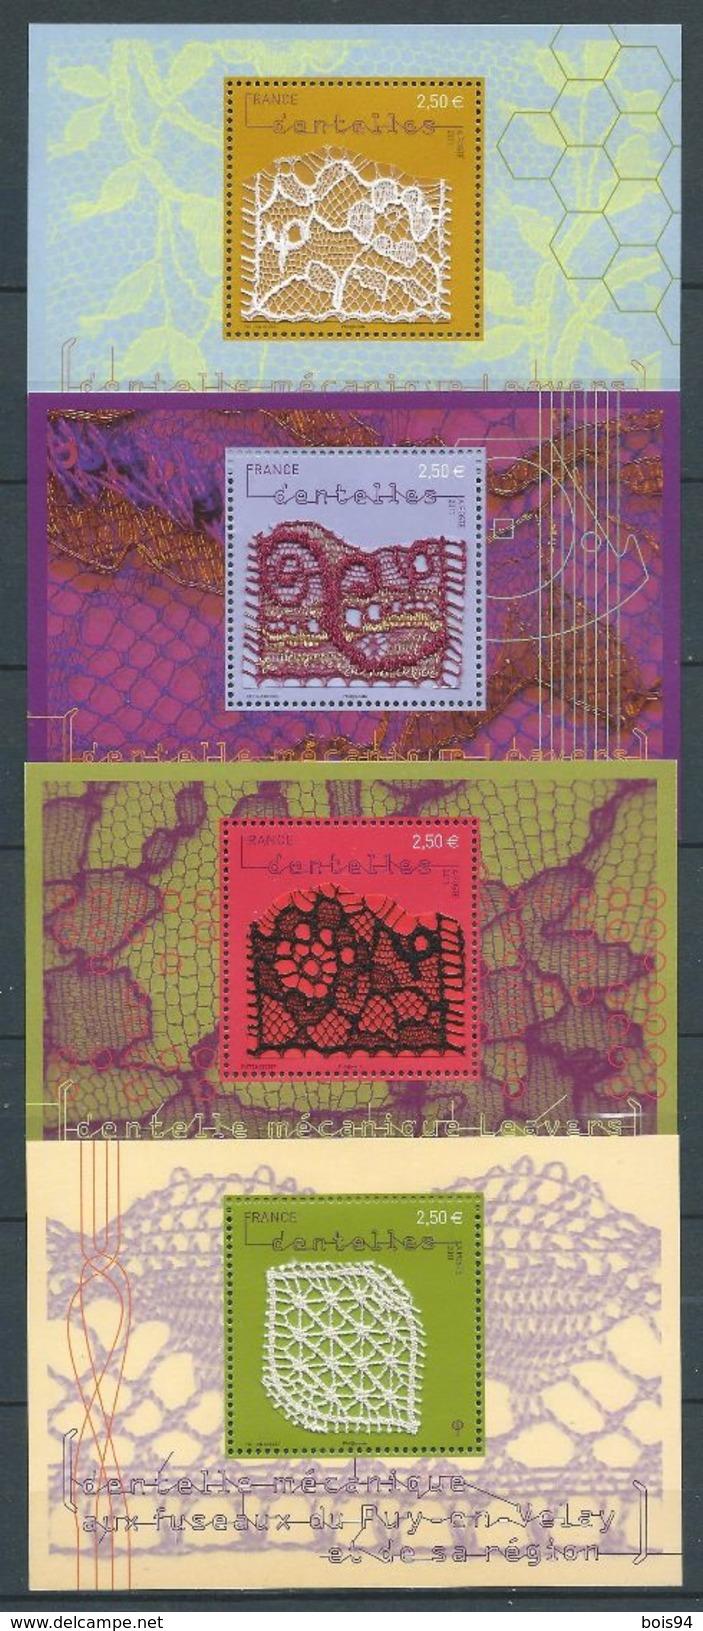 FRANCE 2011 . Feuillets  N°s 4600 à 4603  Neufs ** (MNH) - Blocs & Feuillets